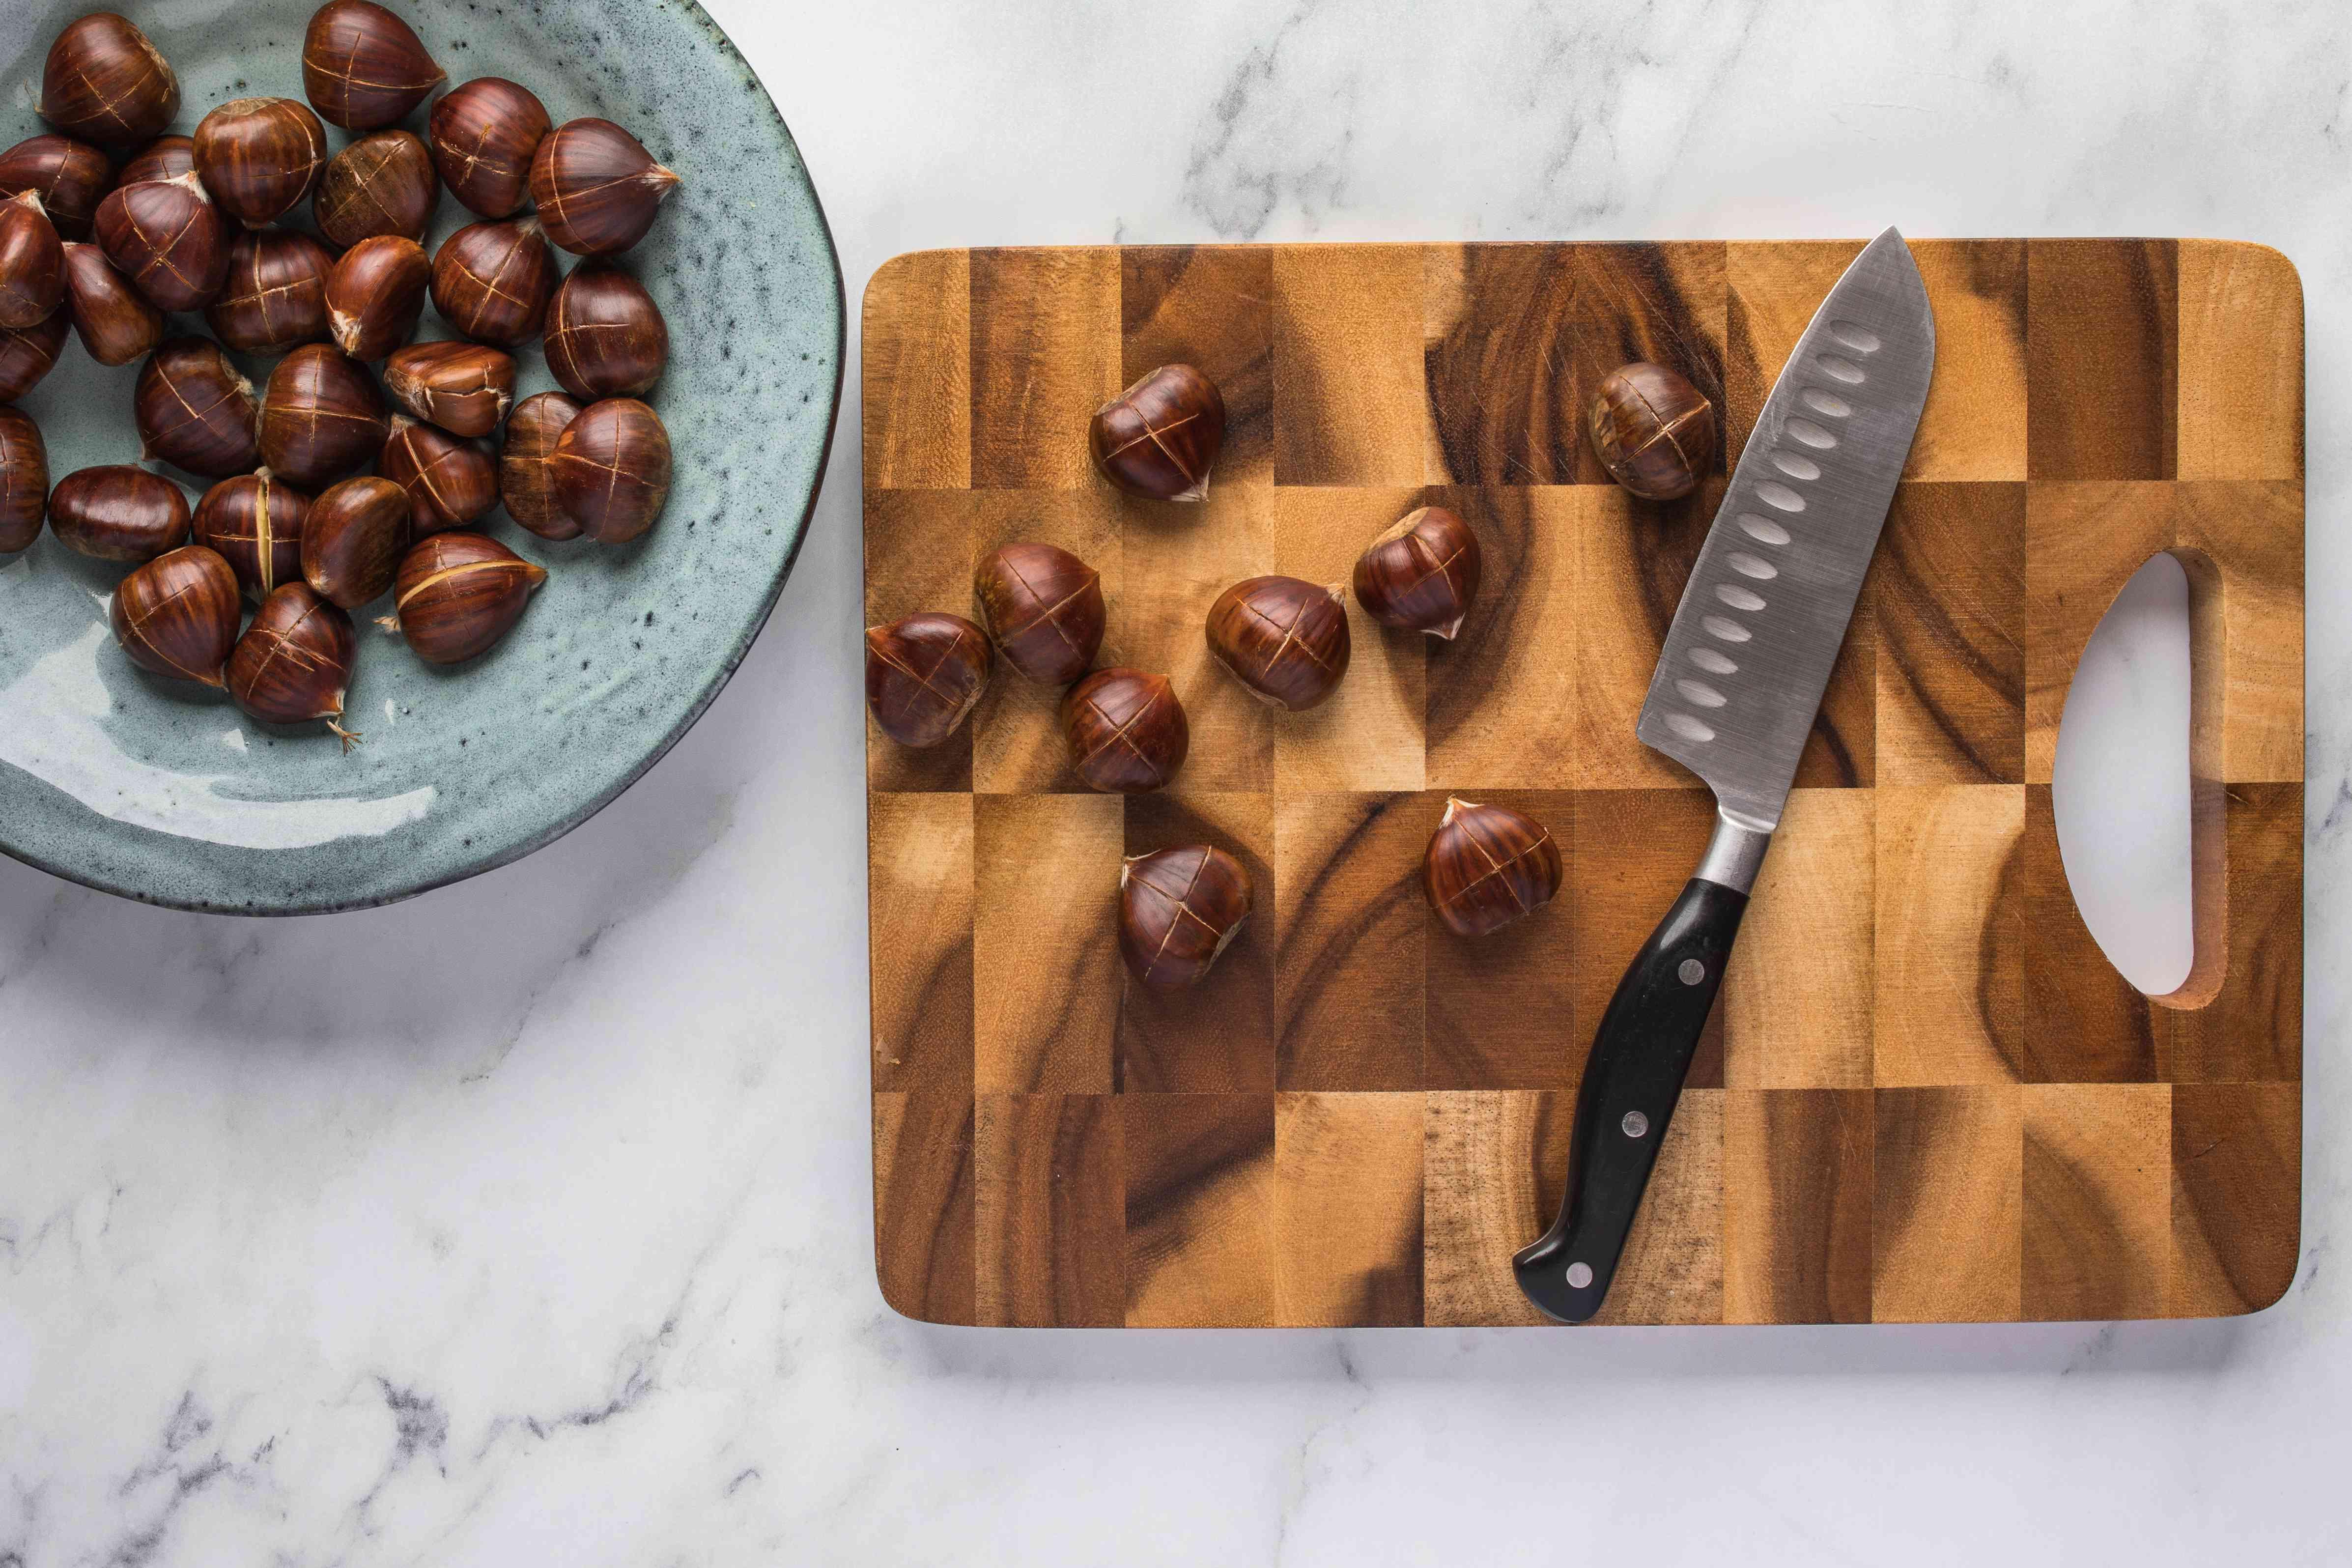 Cut chestnut